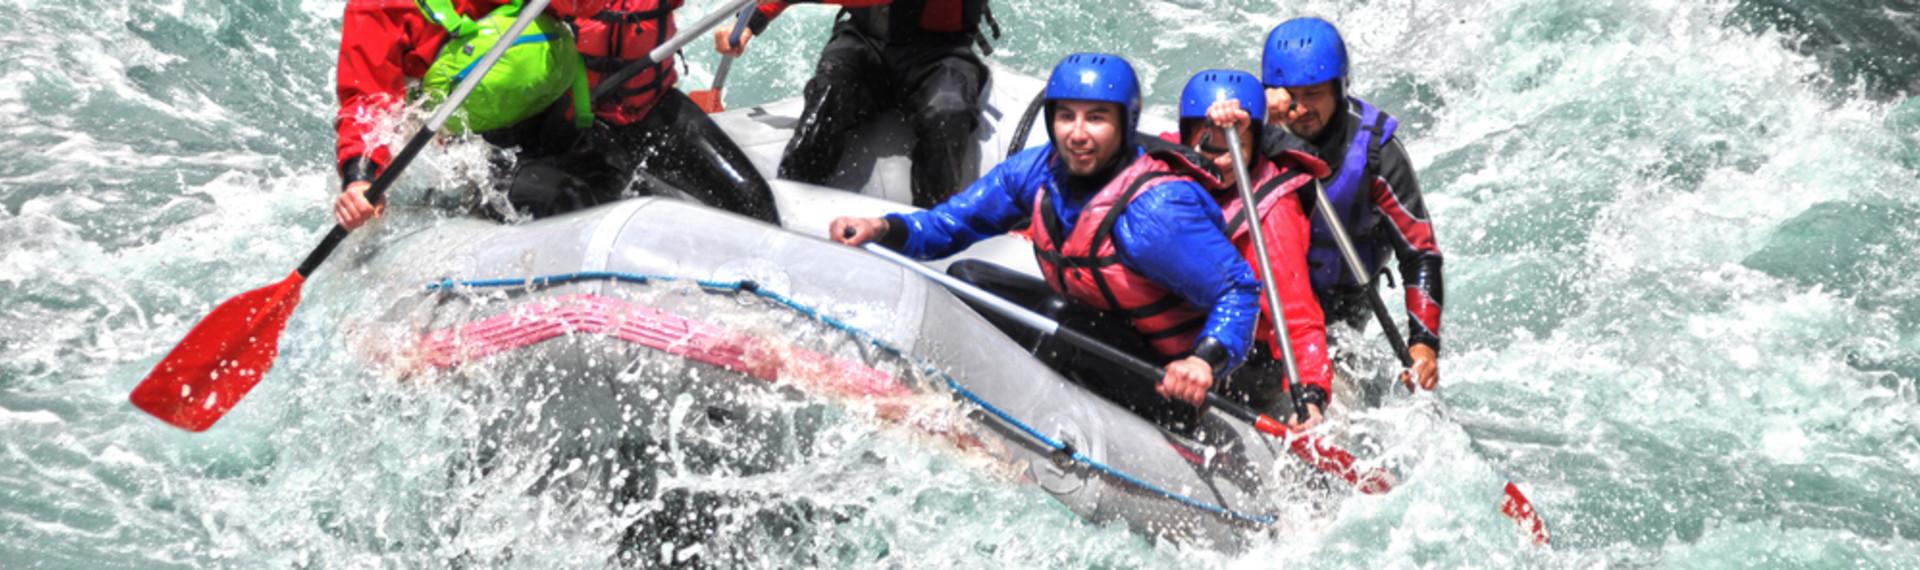 Bratislava White-Water Rafting image